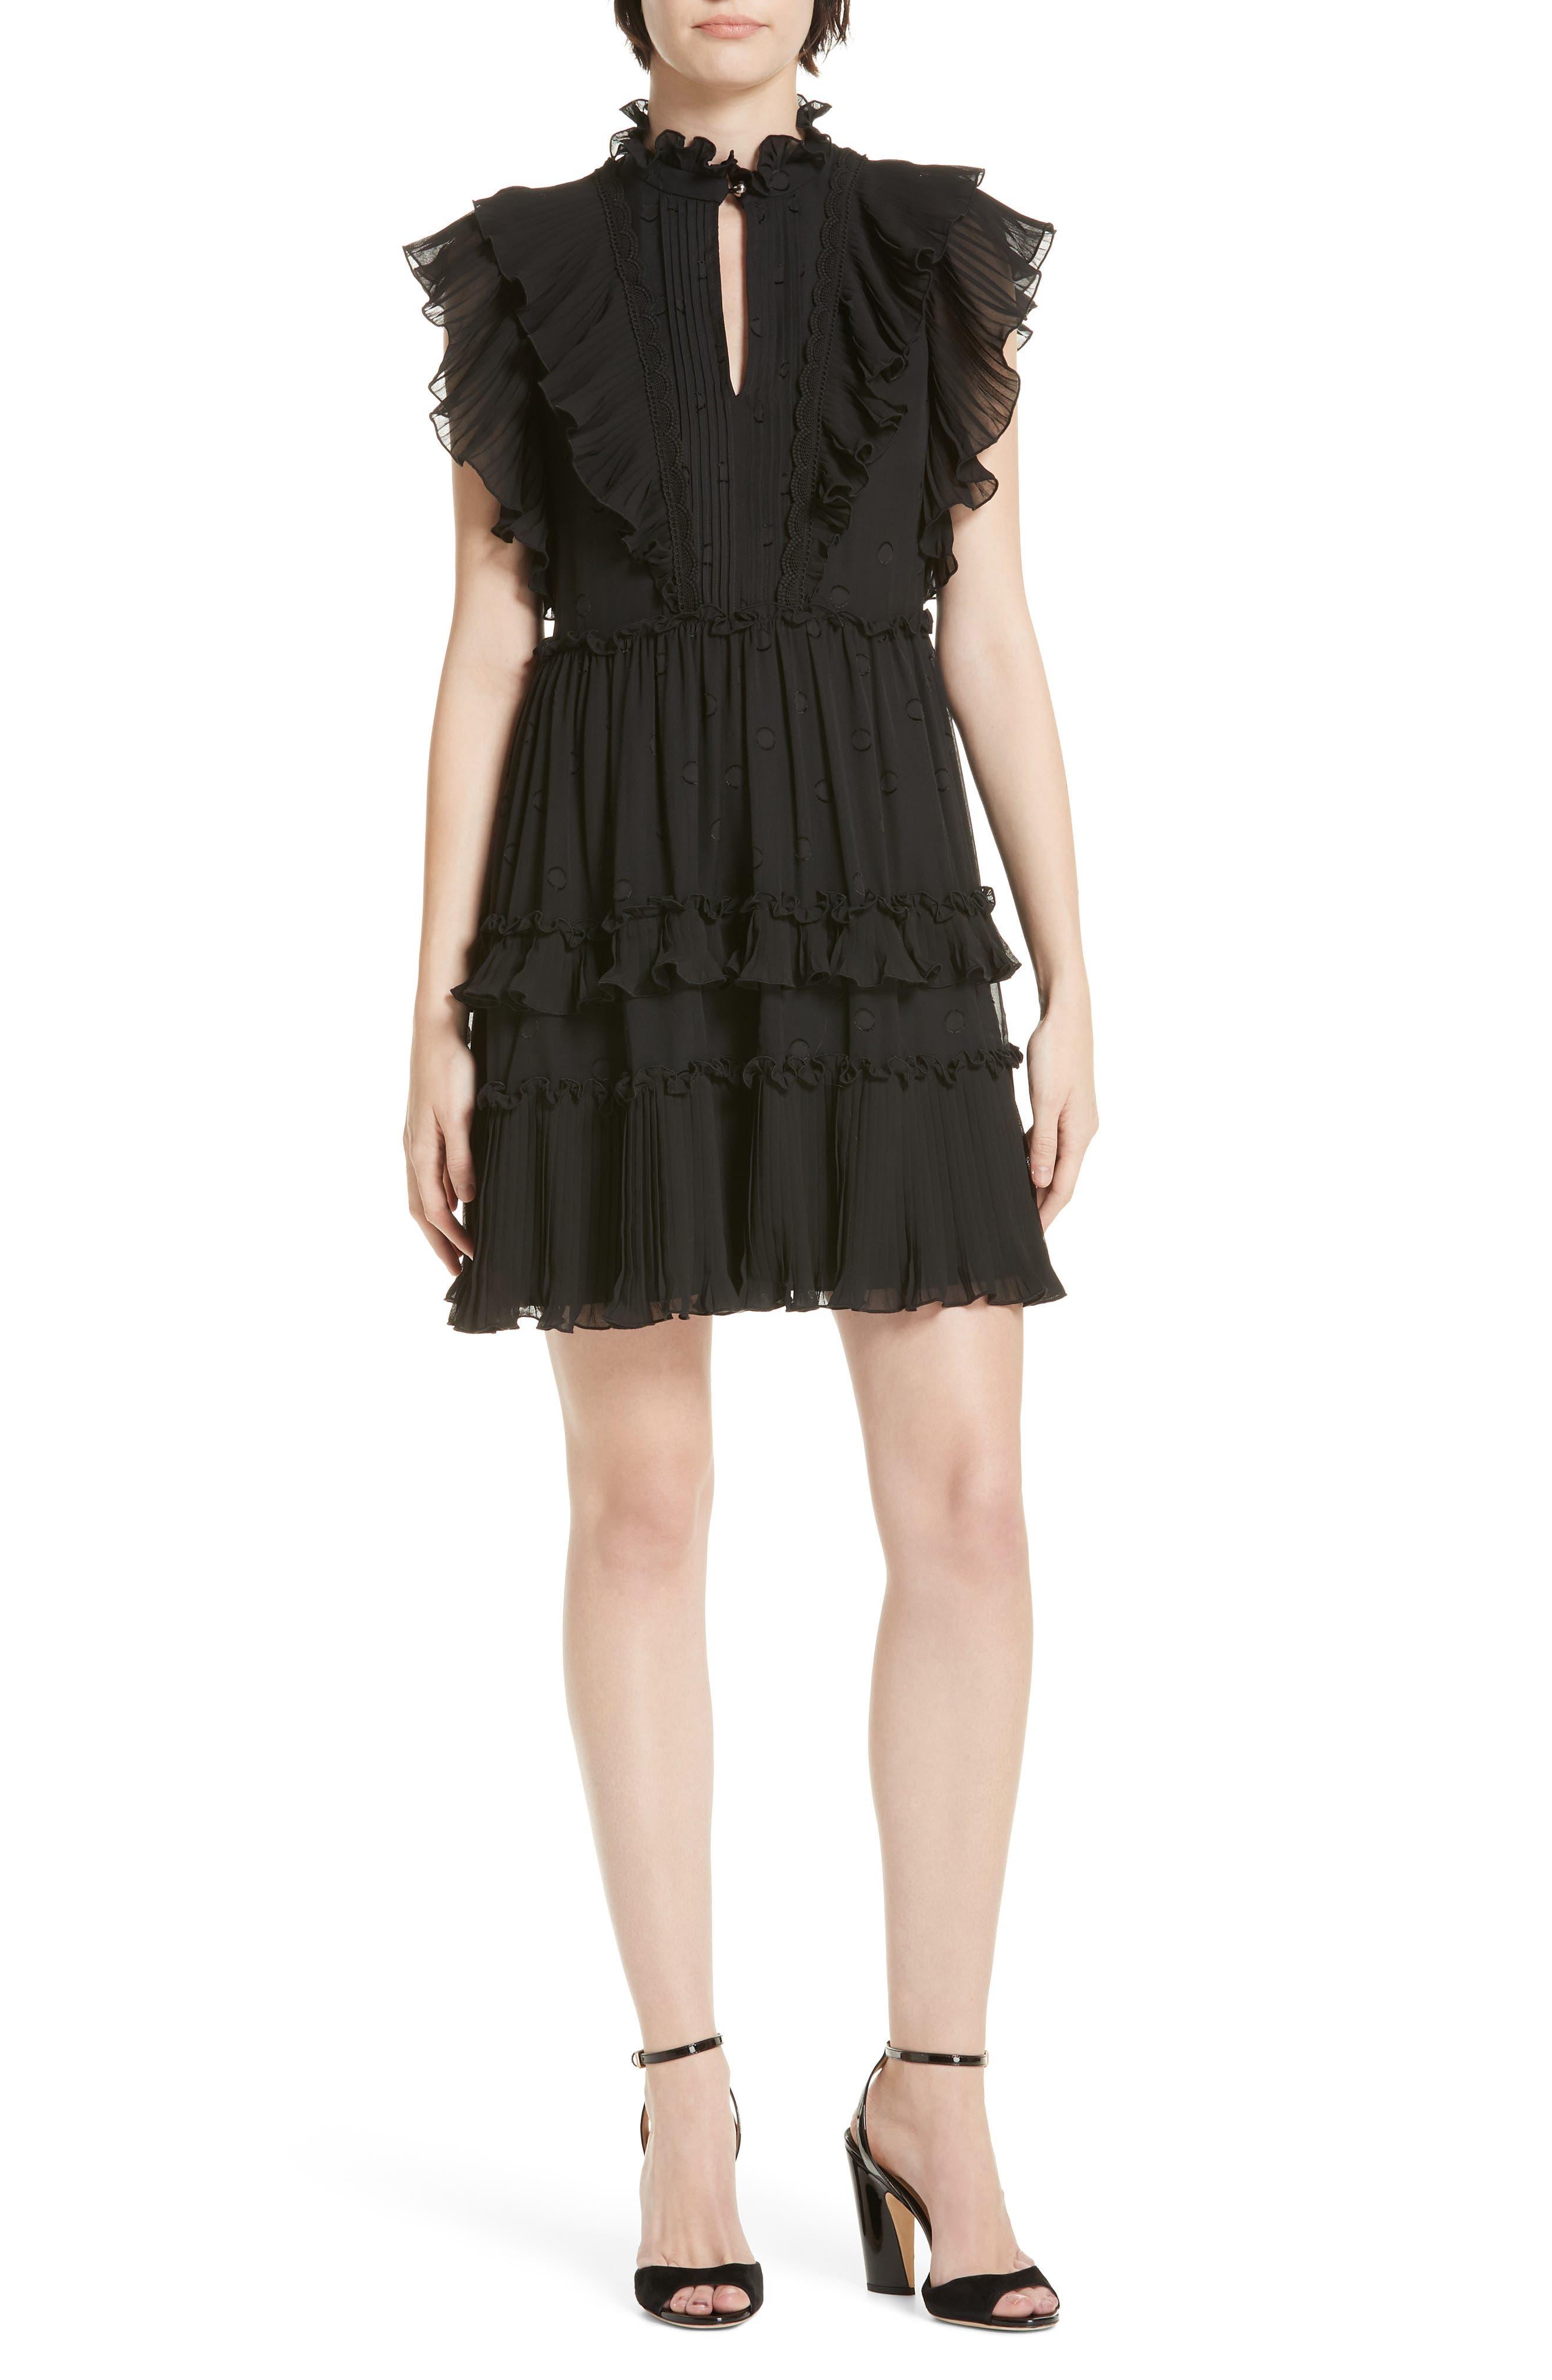 Kate Spade New York Bakery Devore Dot Dress, Black